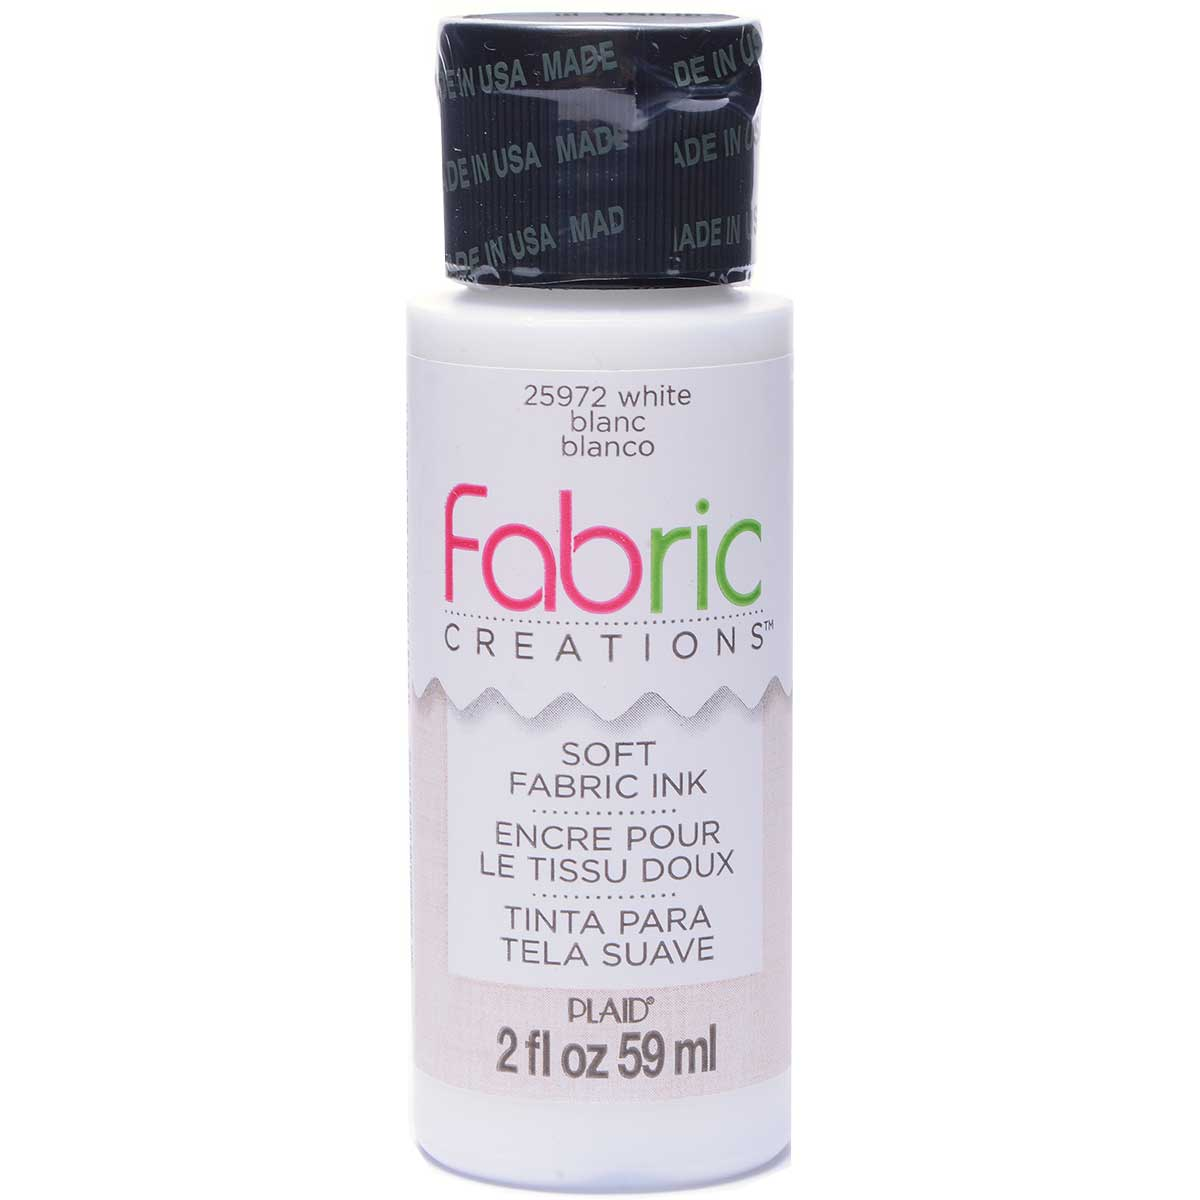 Fabric Creations™ Soft Fabric Inks - White, 2 oz.